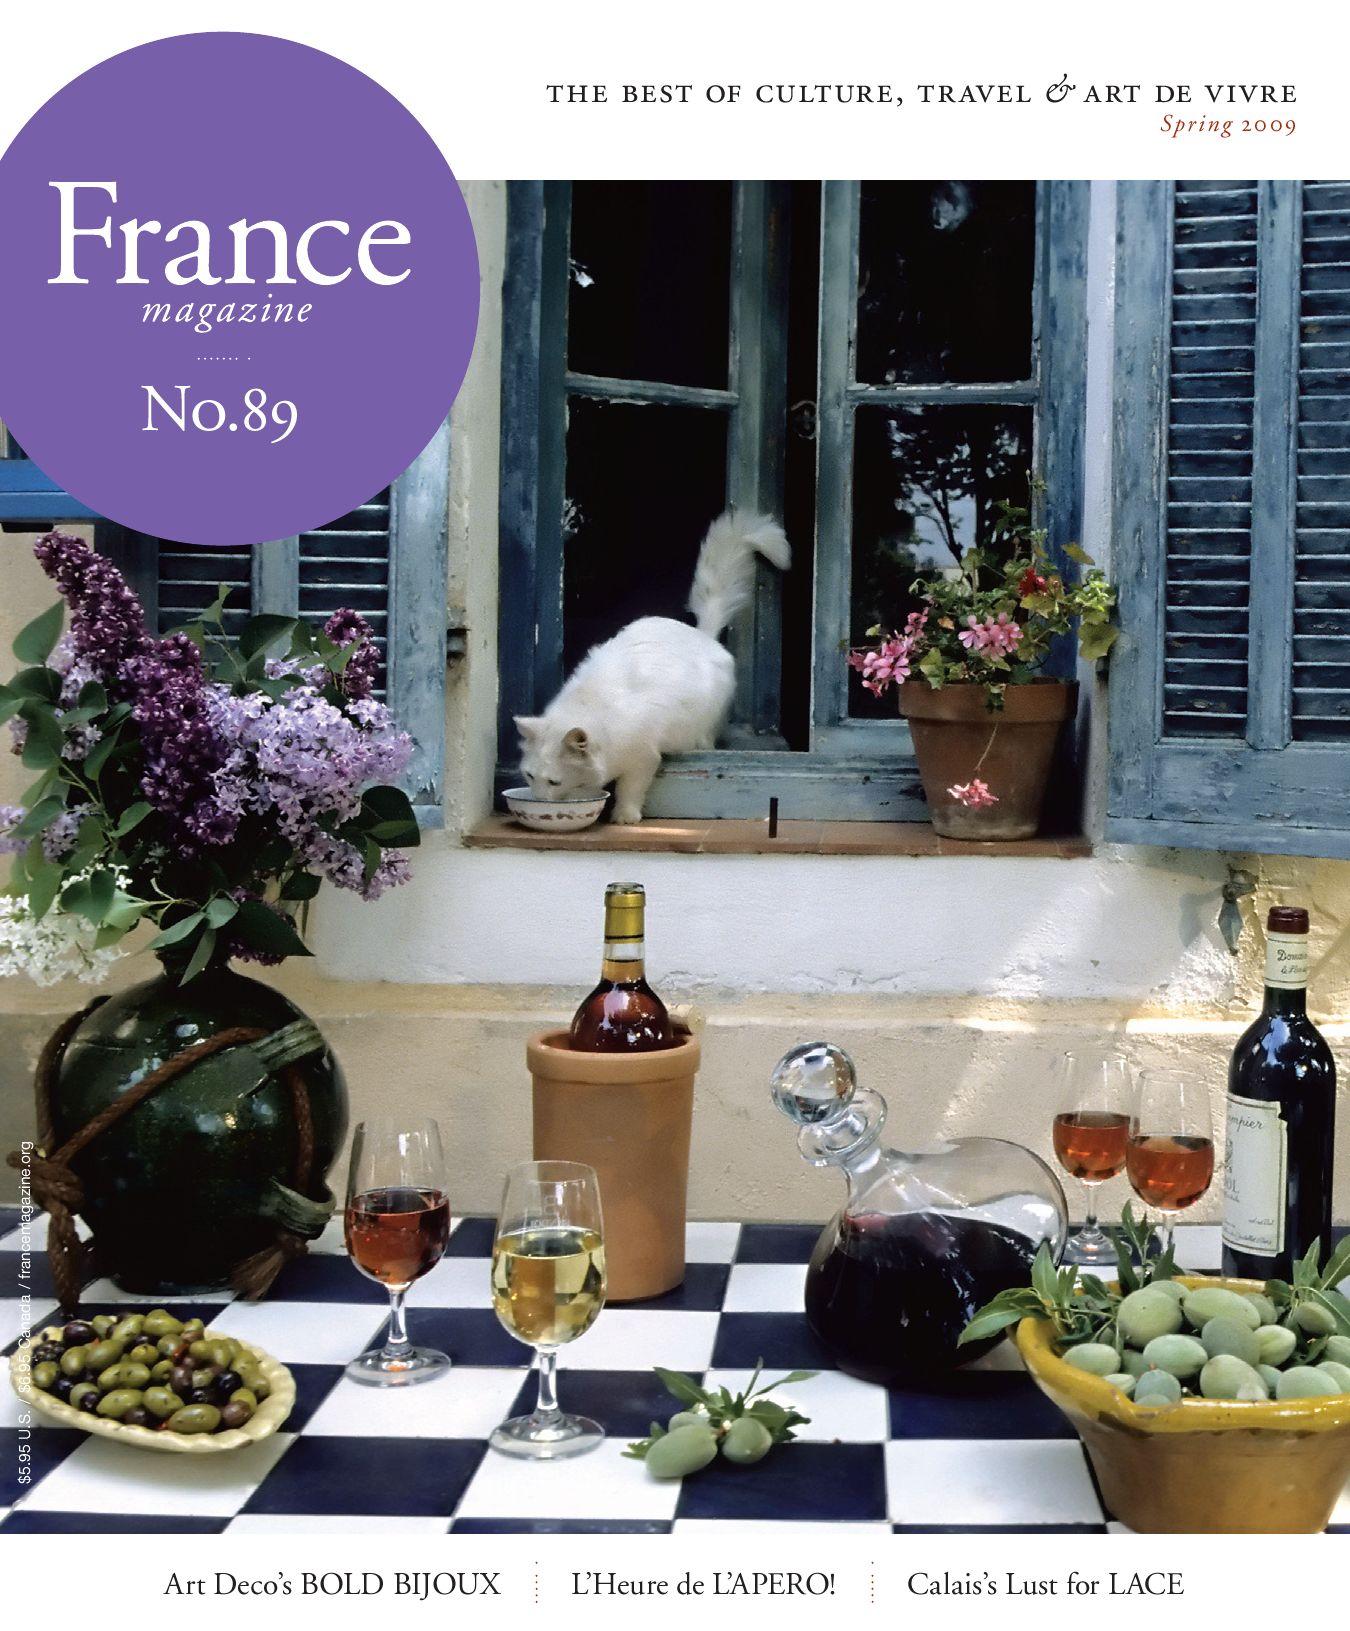 Festival Des Jardins Chaumont Sur Loire 2009 france magazine #89 - spring 2009france magazine - issuu